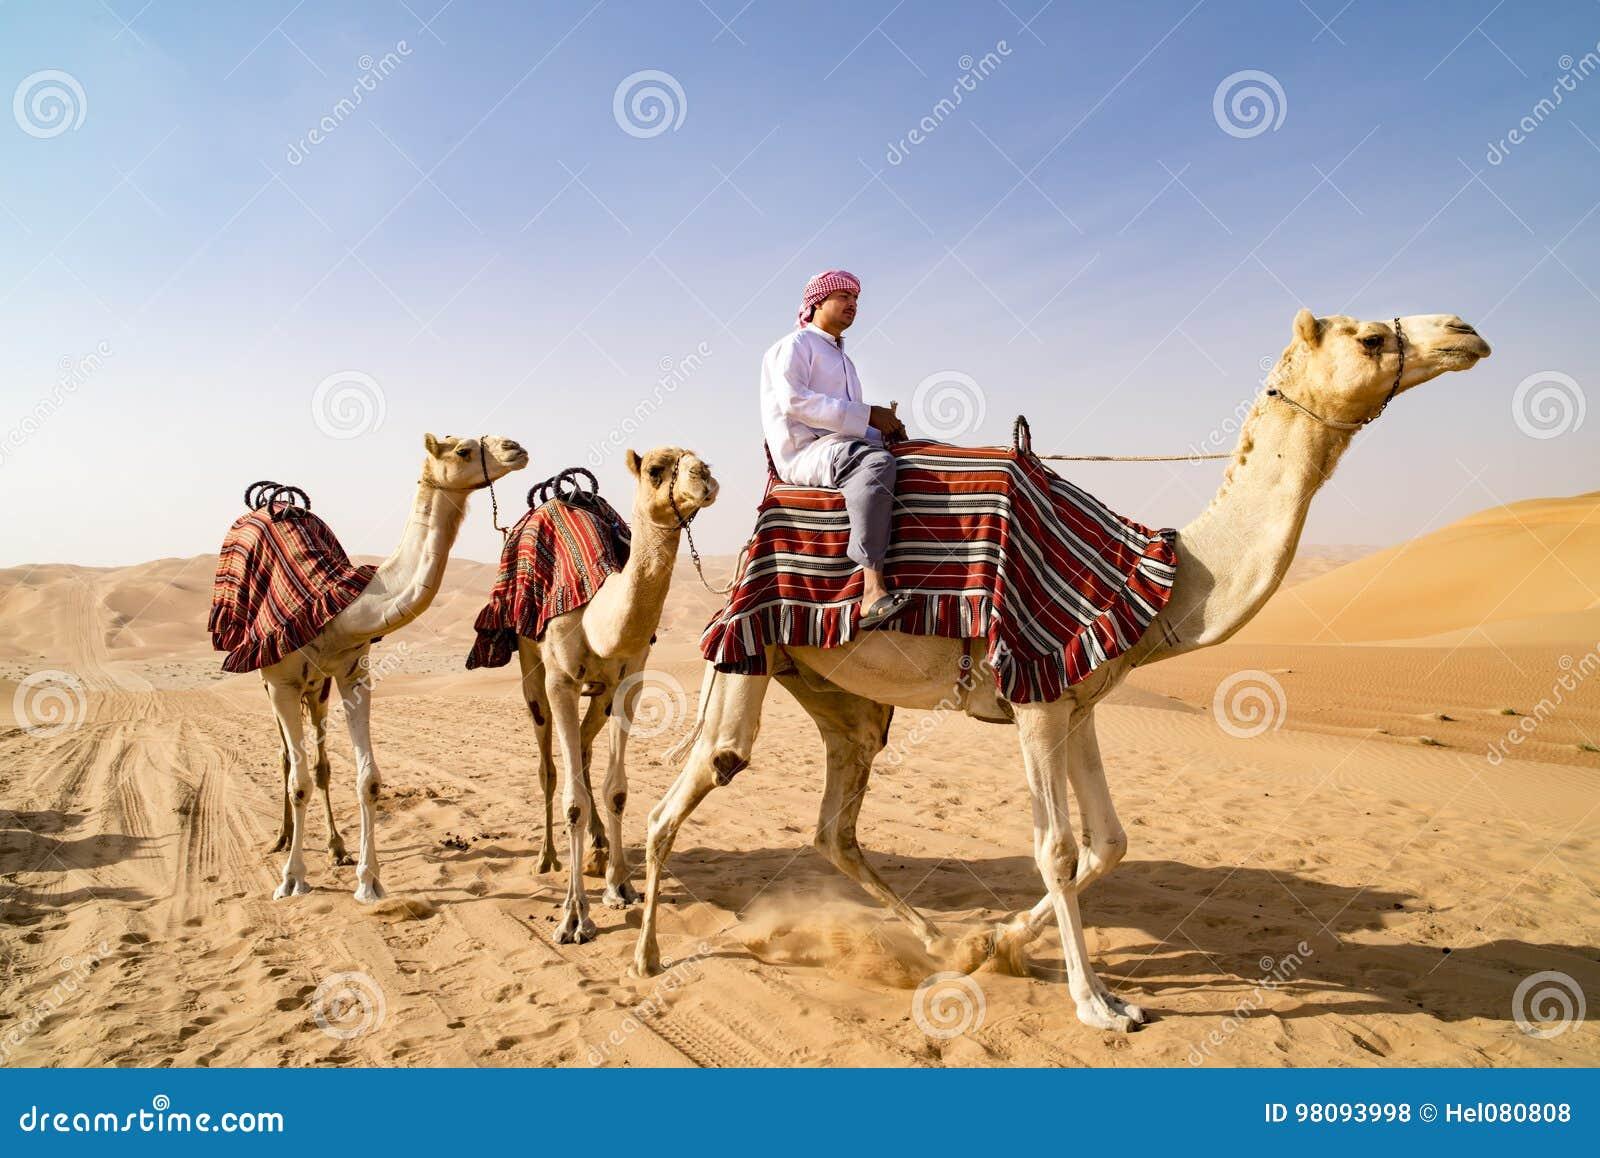 Guiding Camels in desert of Abu Dhabi, UAE. Dromedaries guided from leader.